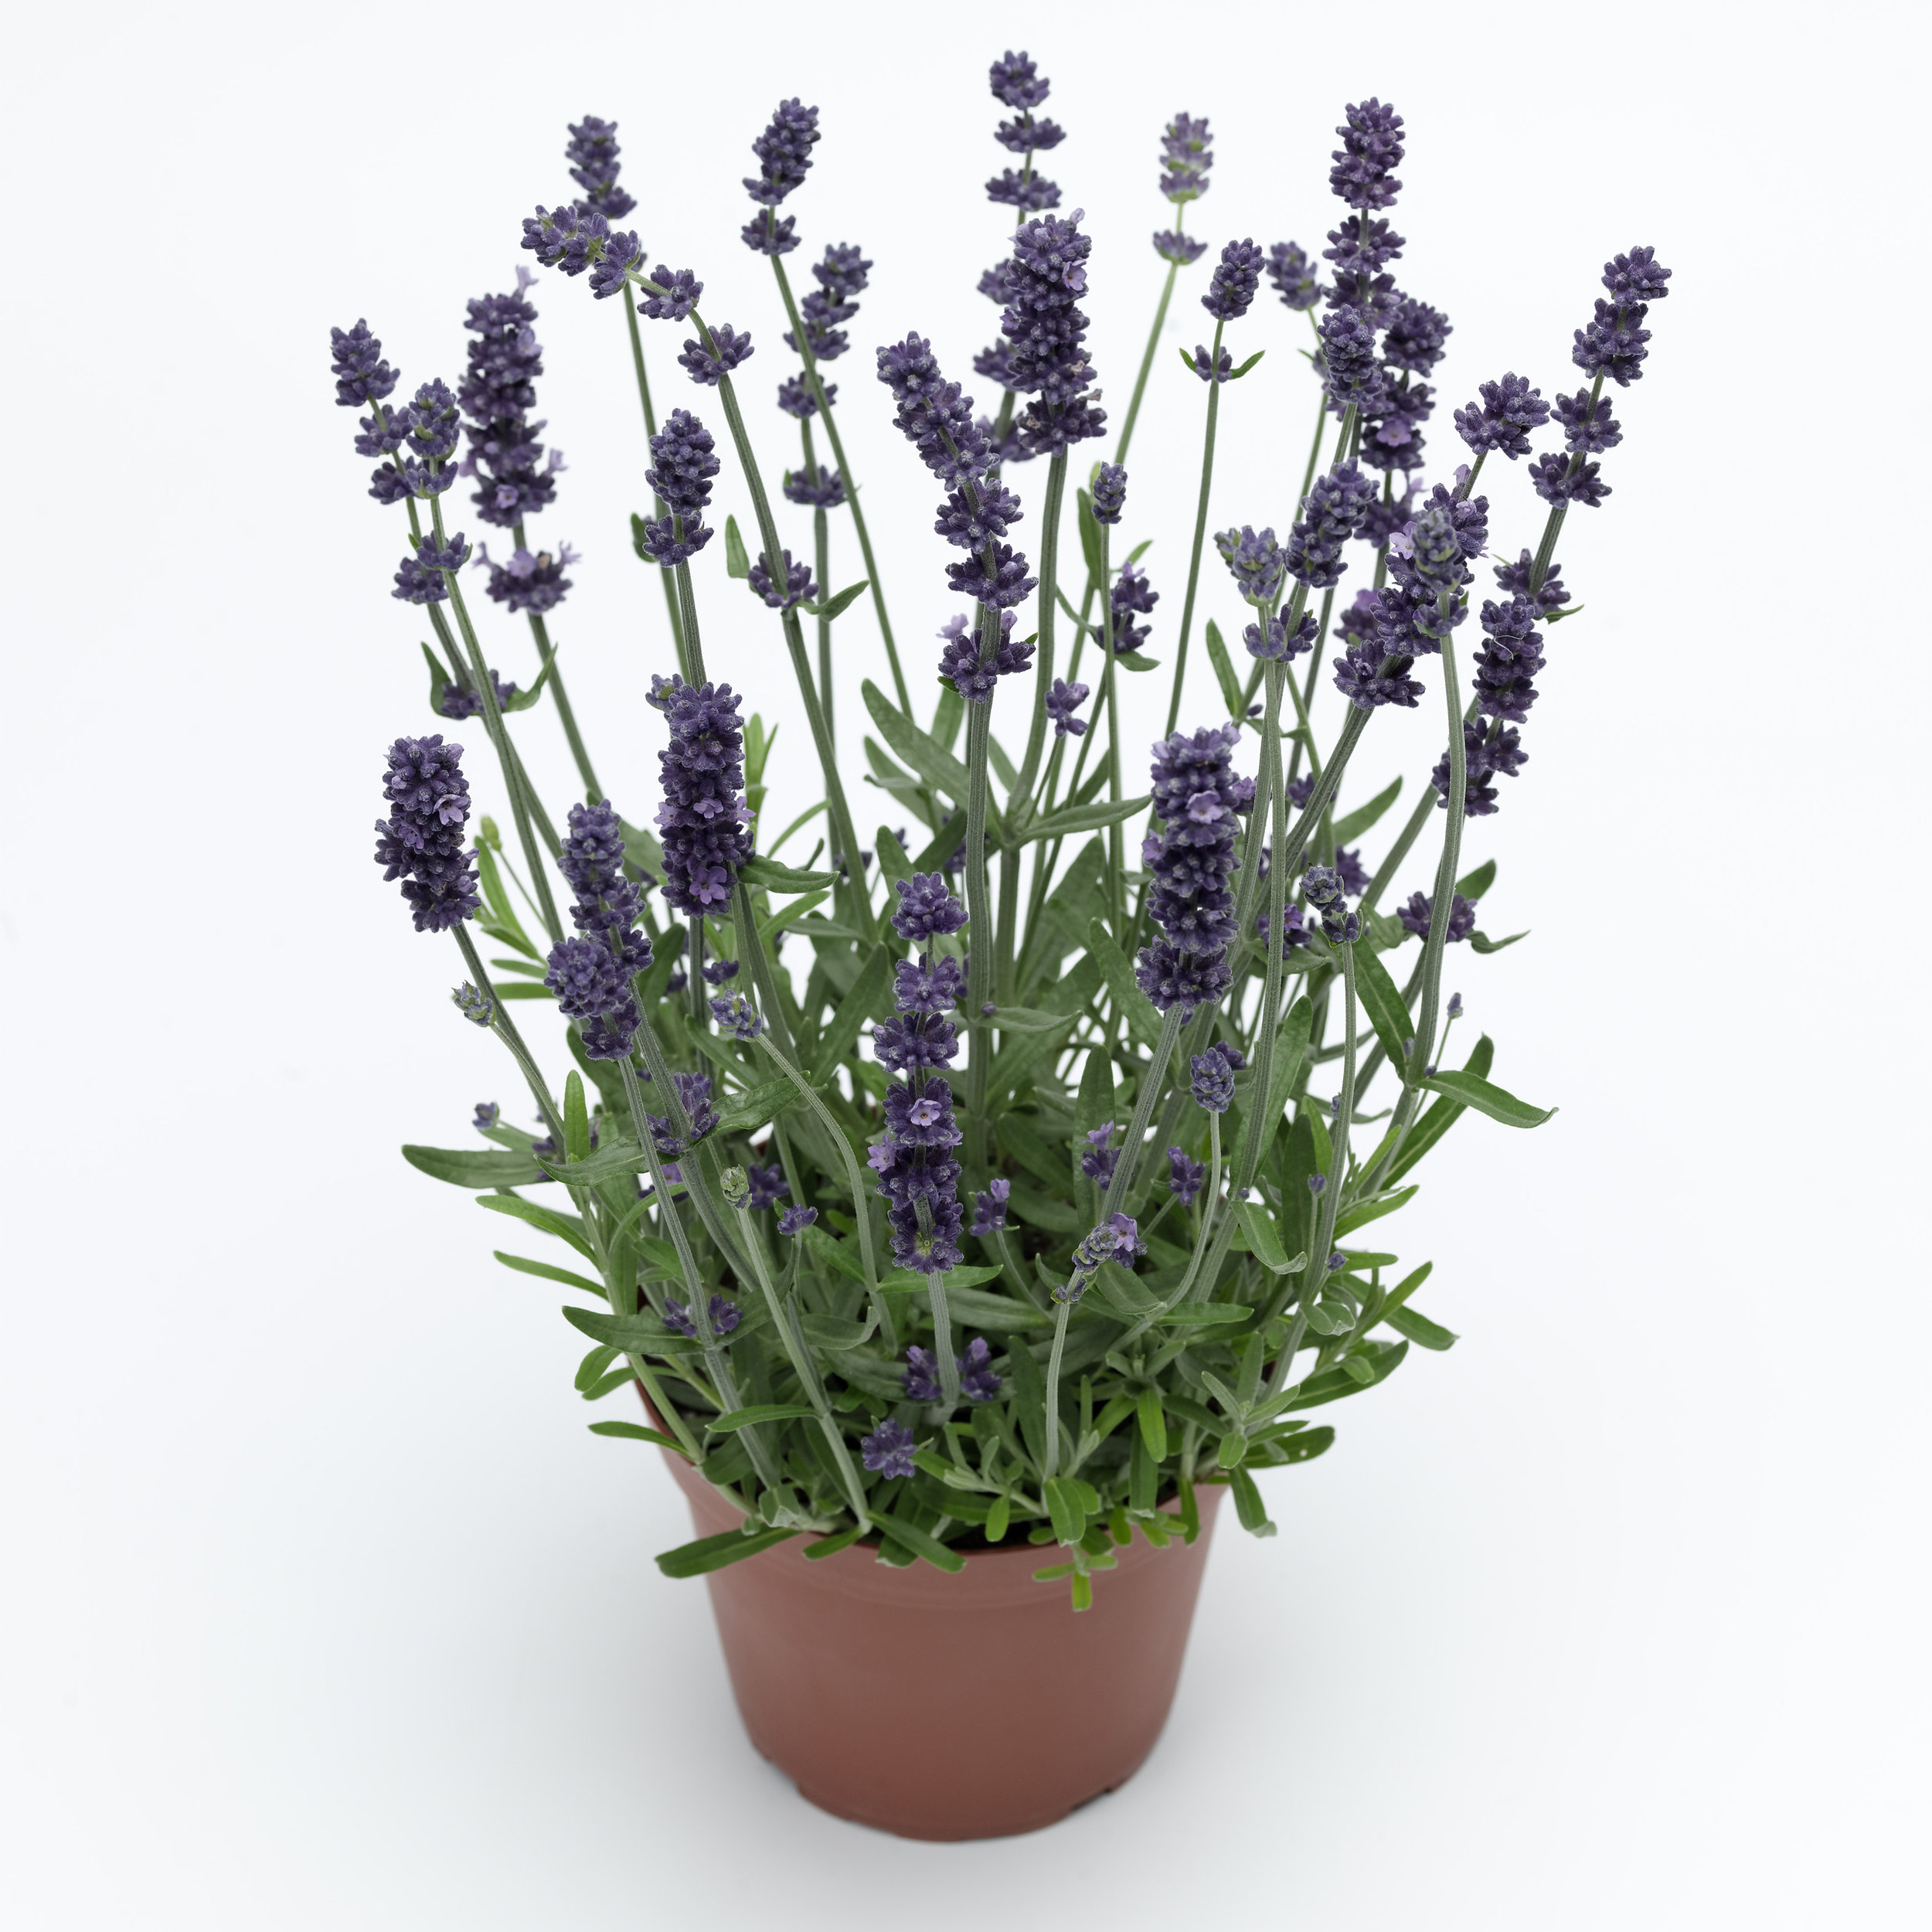 HR_Vegetative_Lavandula_Sentivia™_Sentivia™Early_Blue_70019920_1.jpg